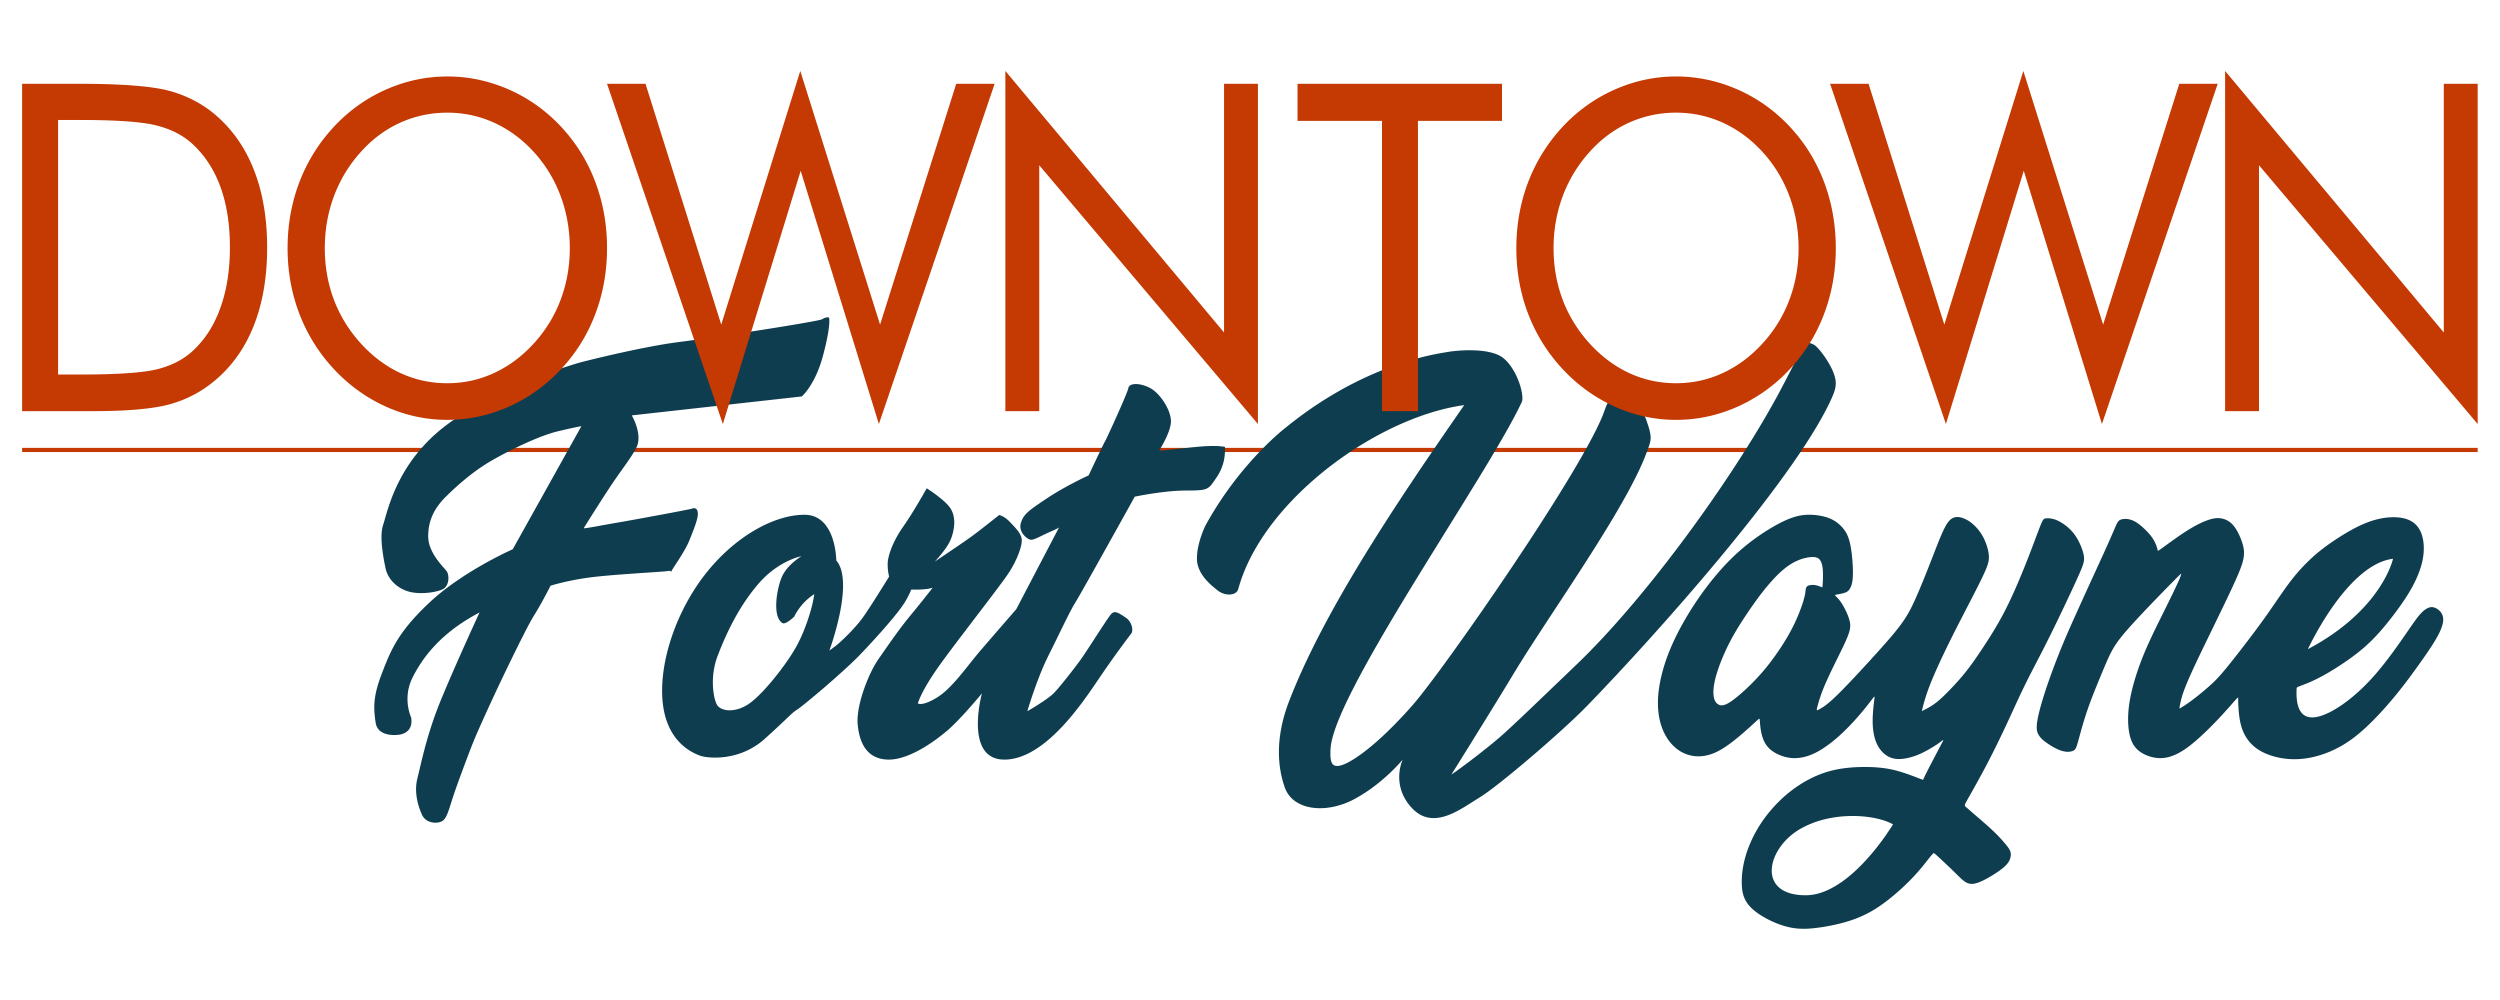 Downtown Fort Wayne Improvement District